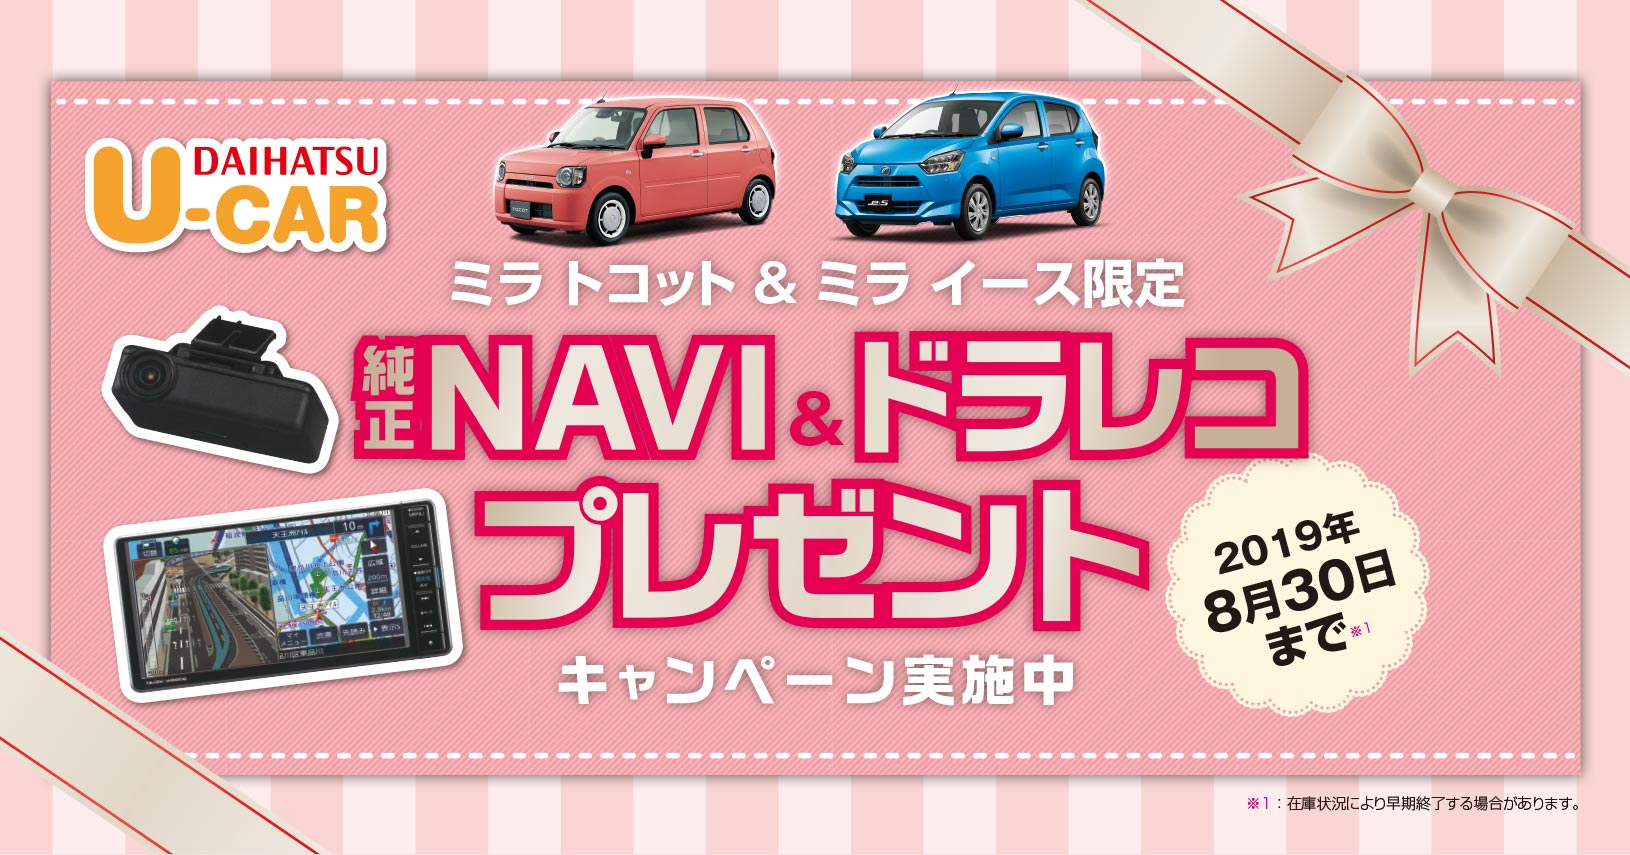 【U-CAR】ミラトコット&ミライース限定!純正ナビ・ドラレコプレゼント!